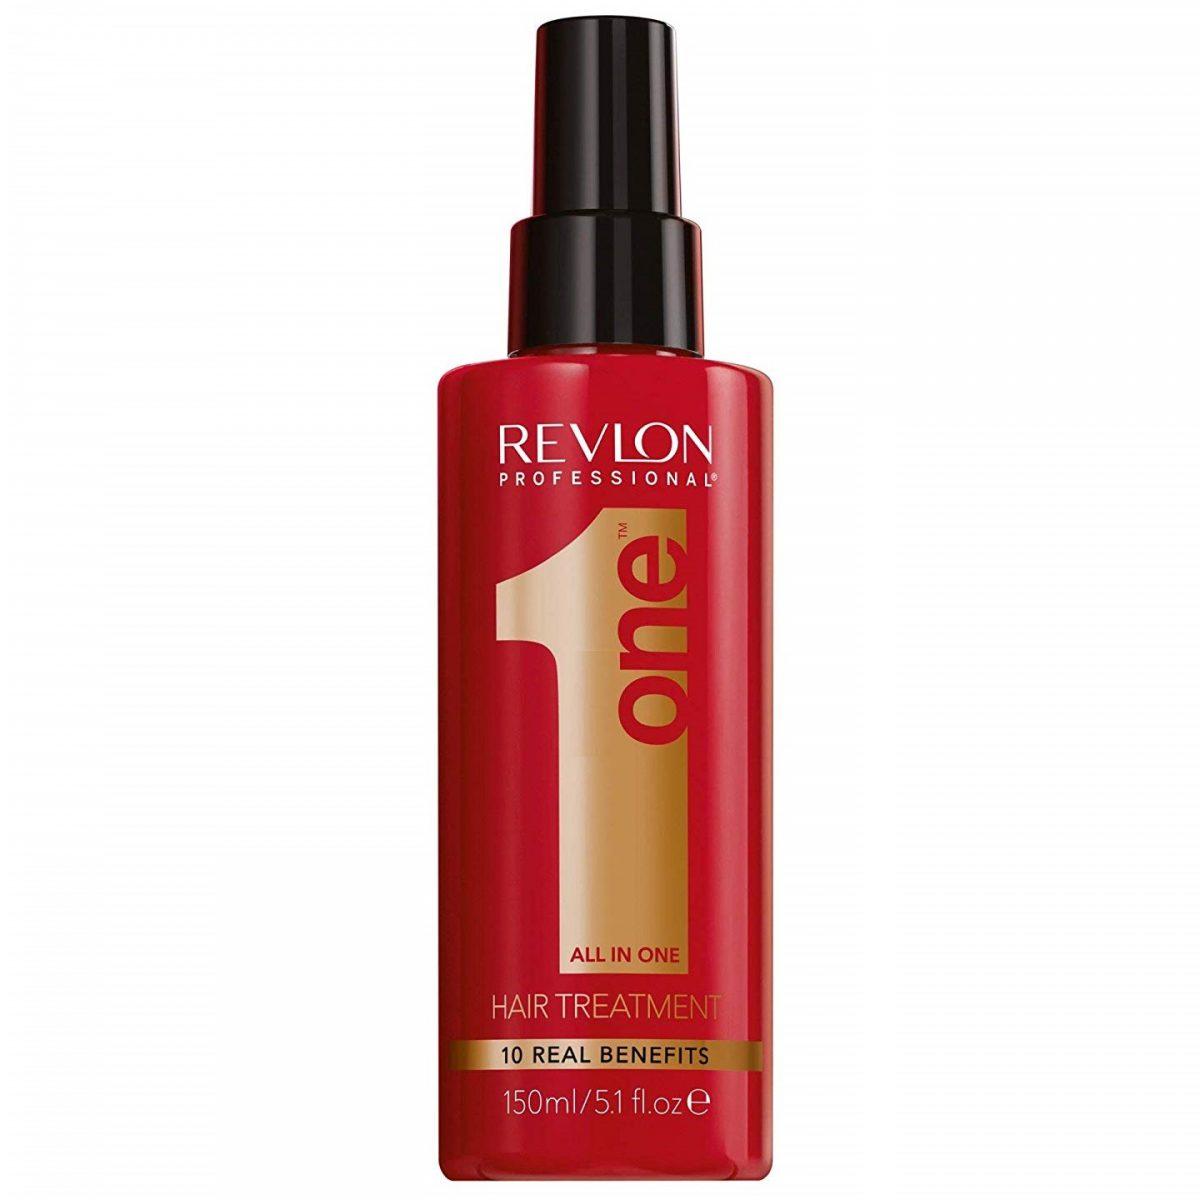 01_Revlon_Profesional_One_Hair_Treatment_150ml.jpg